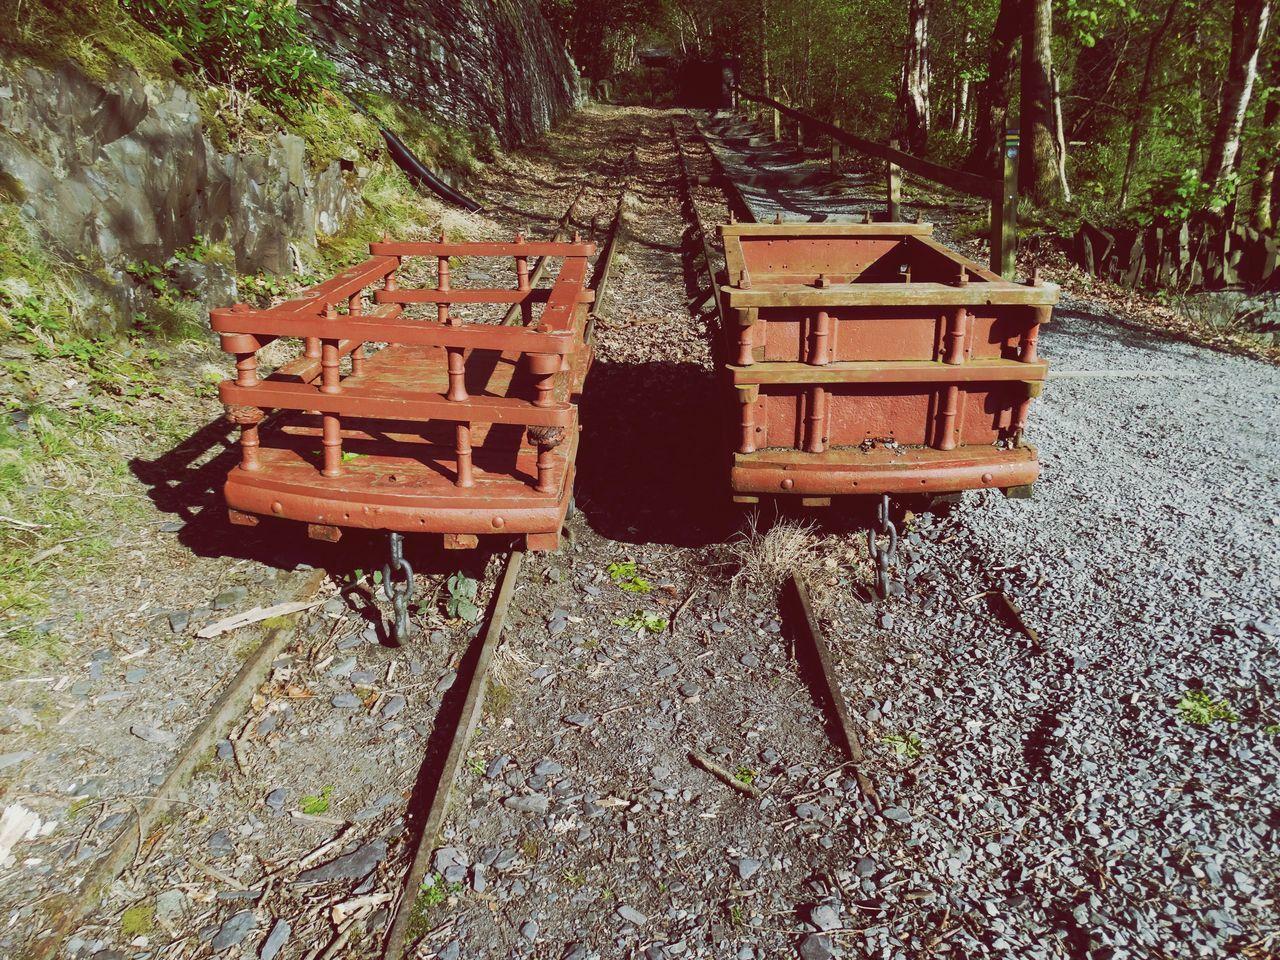 Mining carts on tracks. Day Mining Mining Heritage Mine Cart Mine Truck Outdoors Old Historic Nature Track Tracks Railway Rail Track Cart Truck Trucks Up Hill History Mining Industry Work